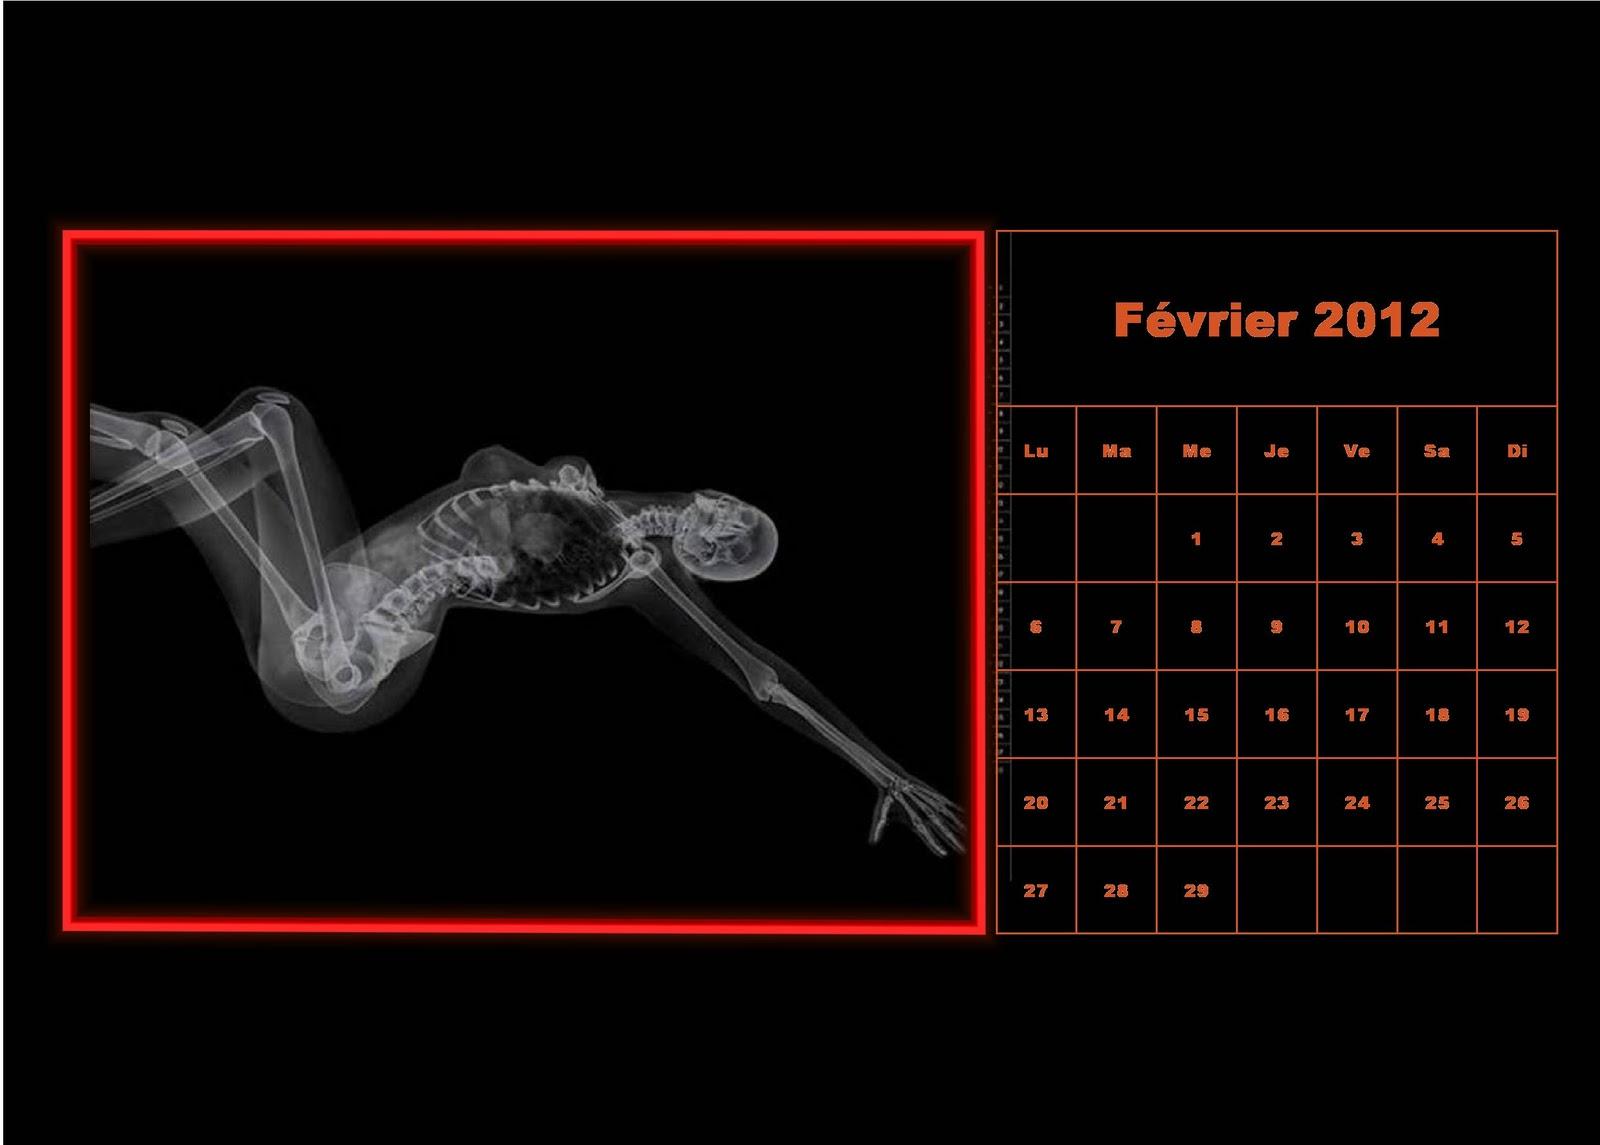 calendrier des rencontres euro 2012